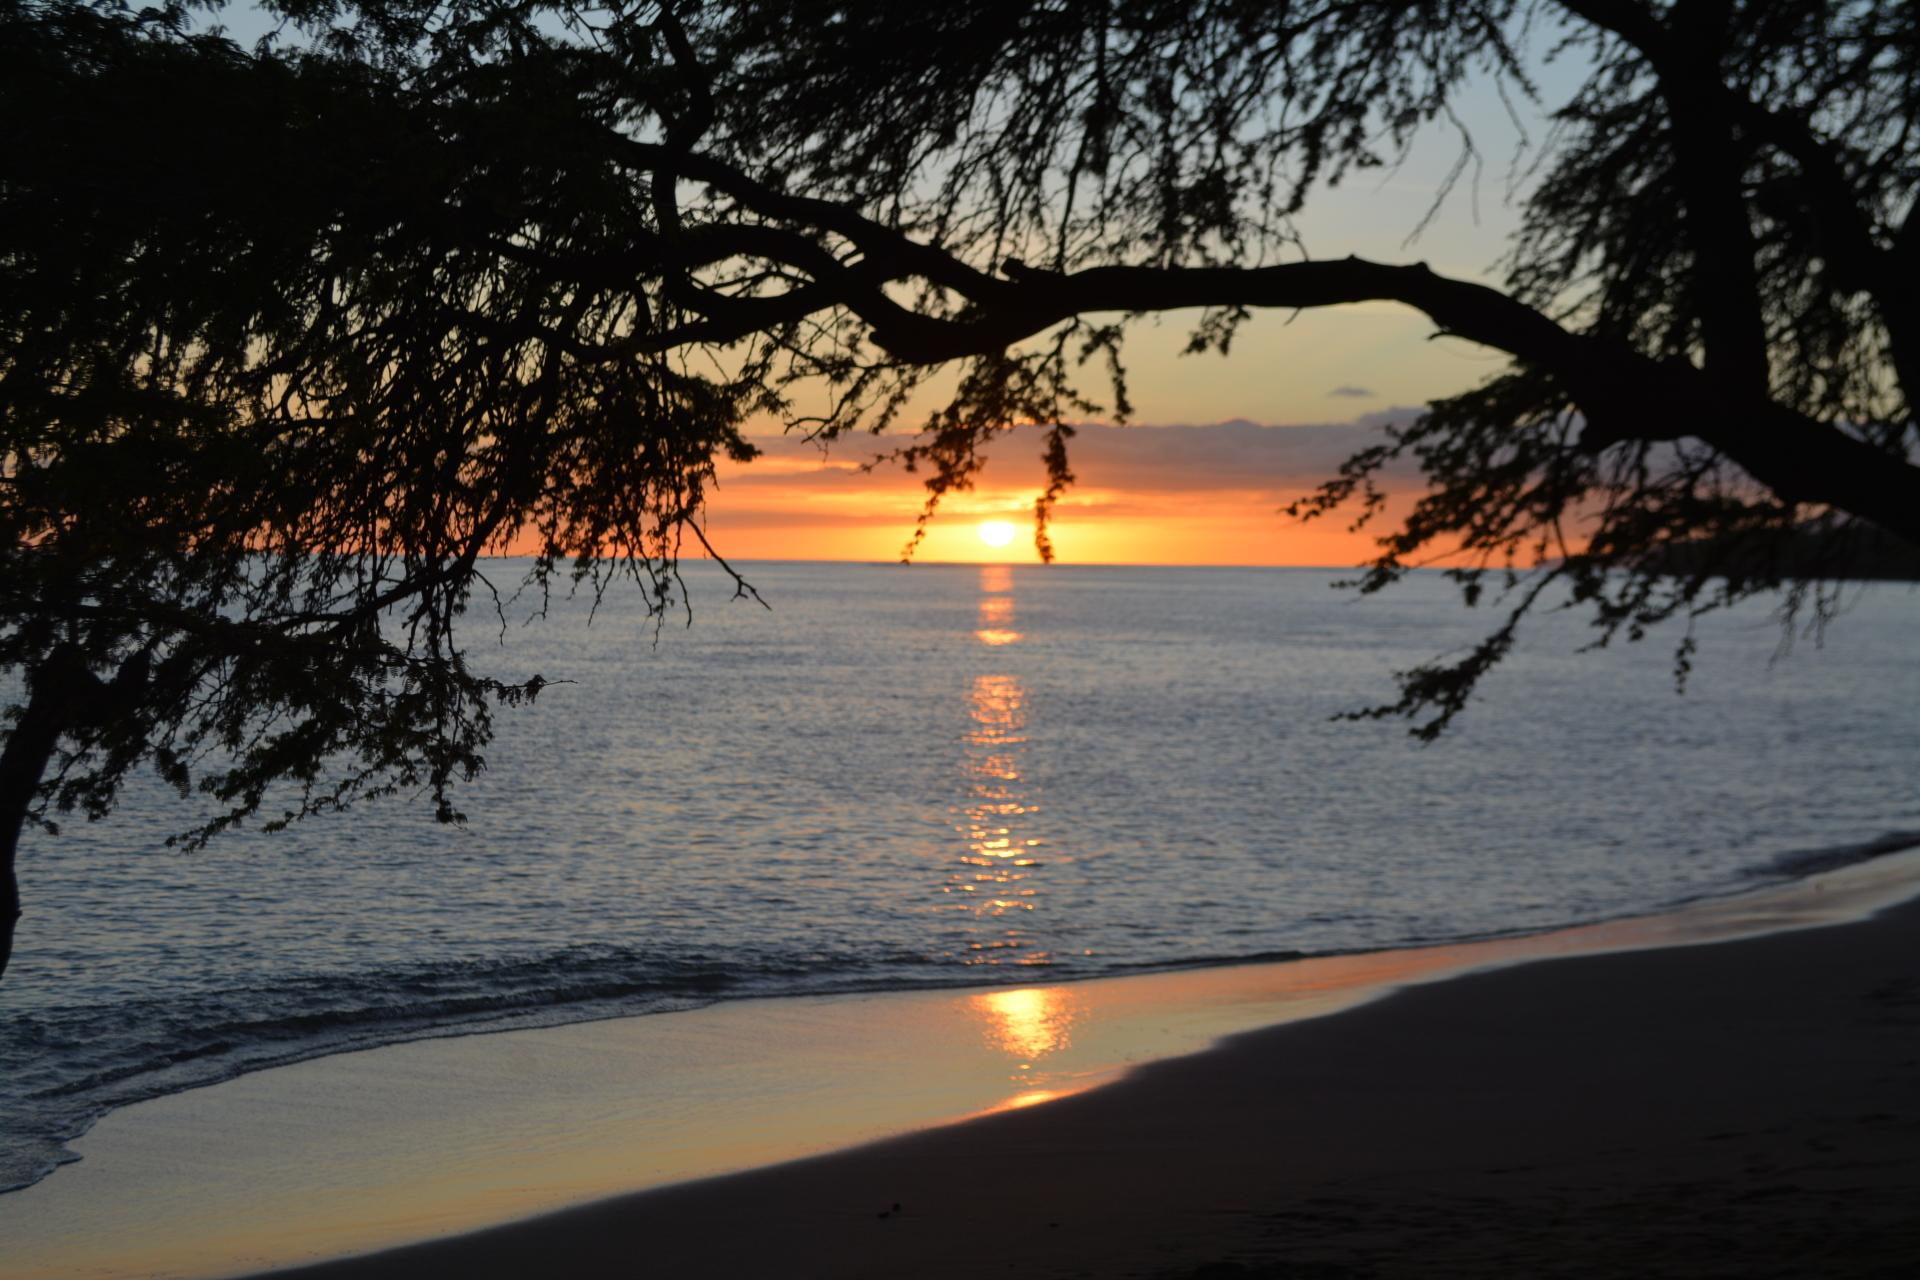 Maui Sunset Double Click Please